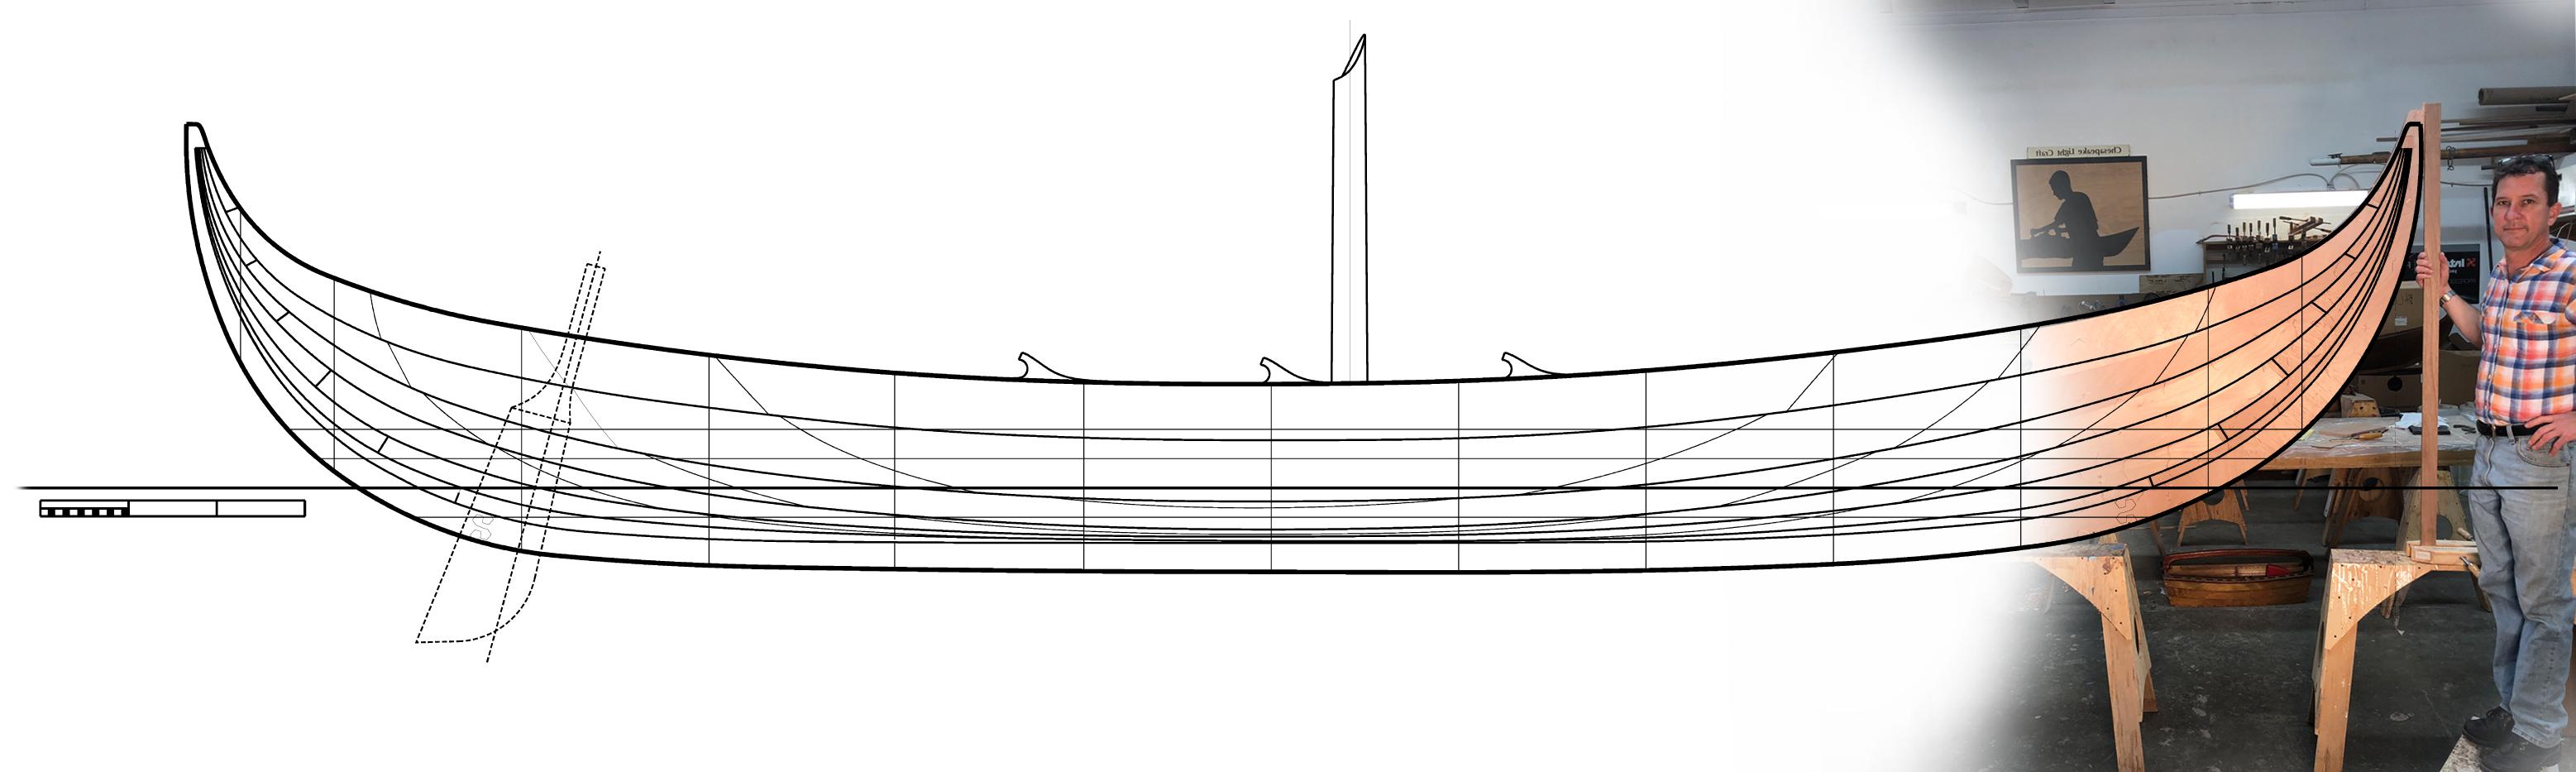 Gislinge Boat